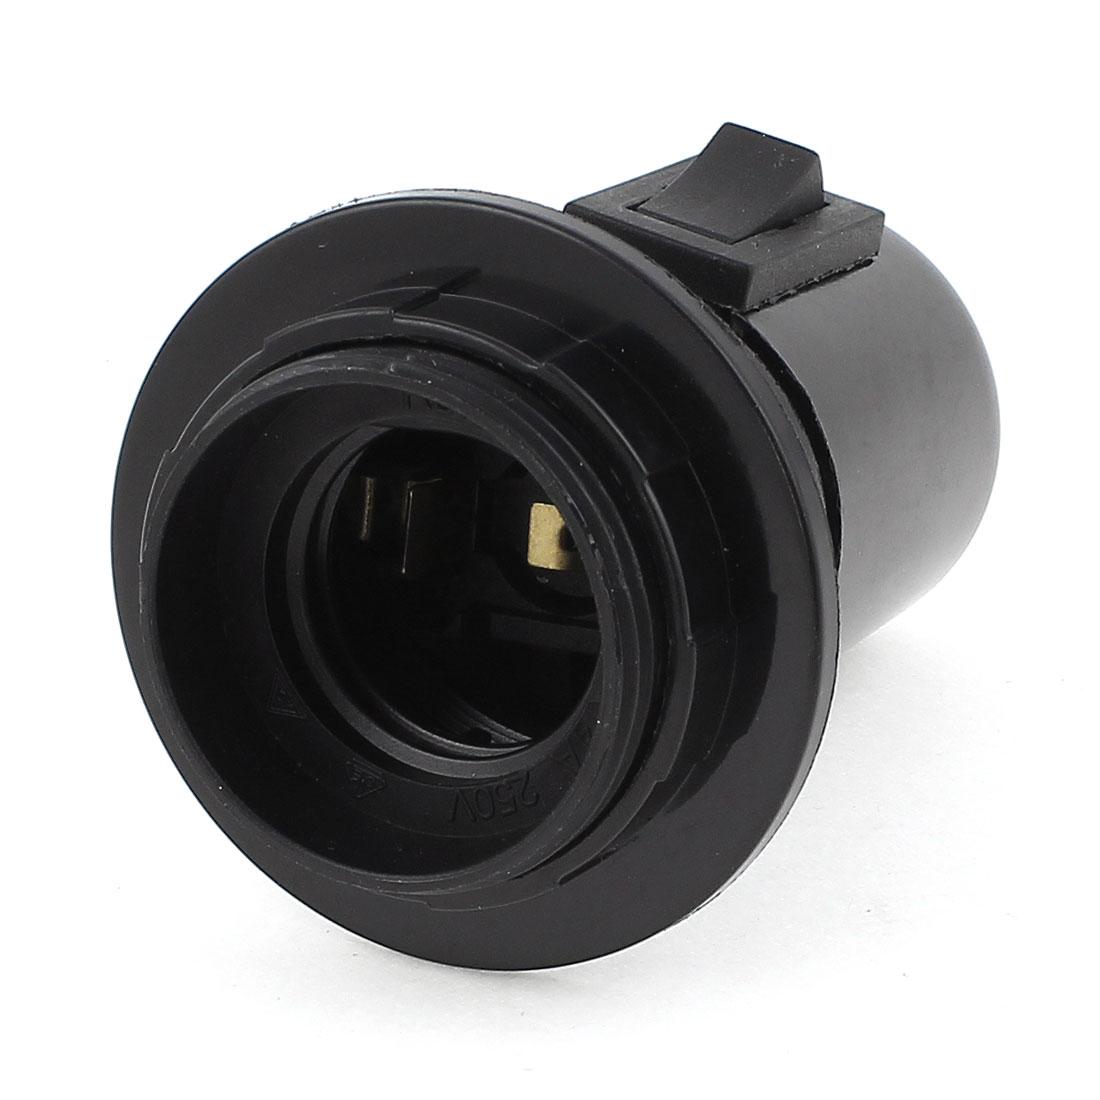 Black Control Switch E27 Bulb Base Screw Lamp Holder Socket Converter